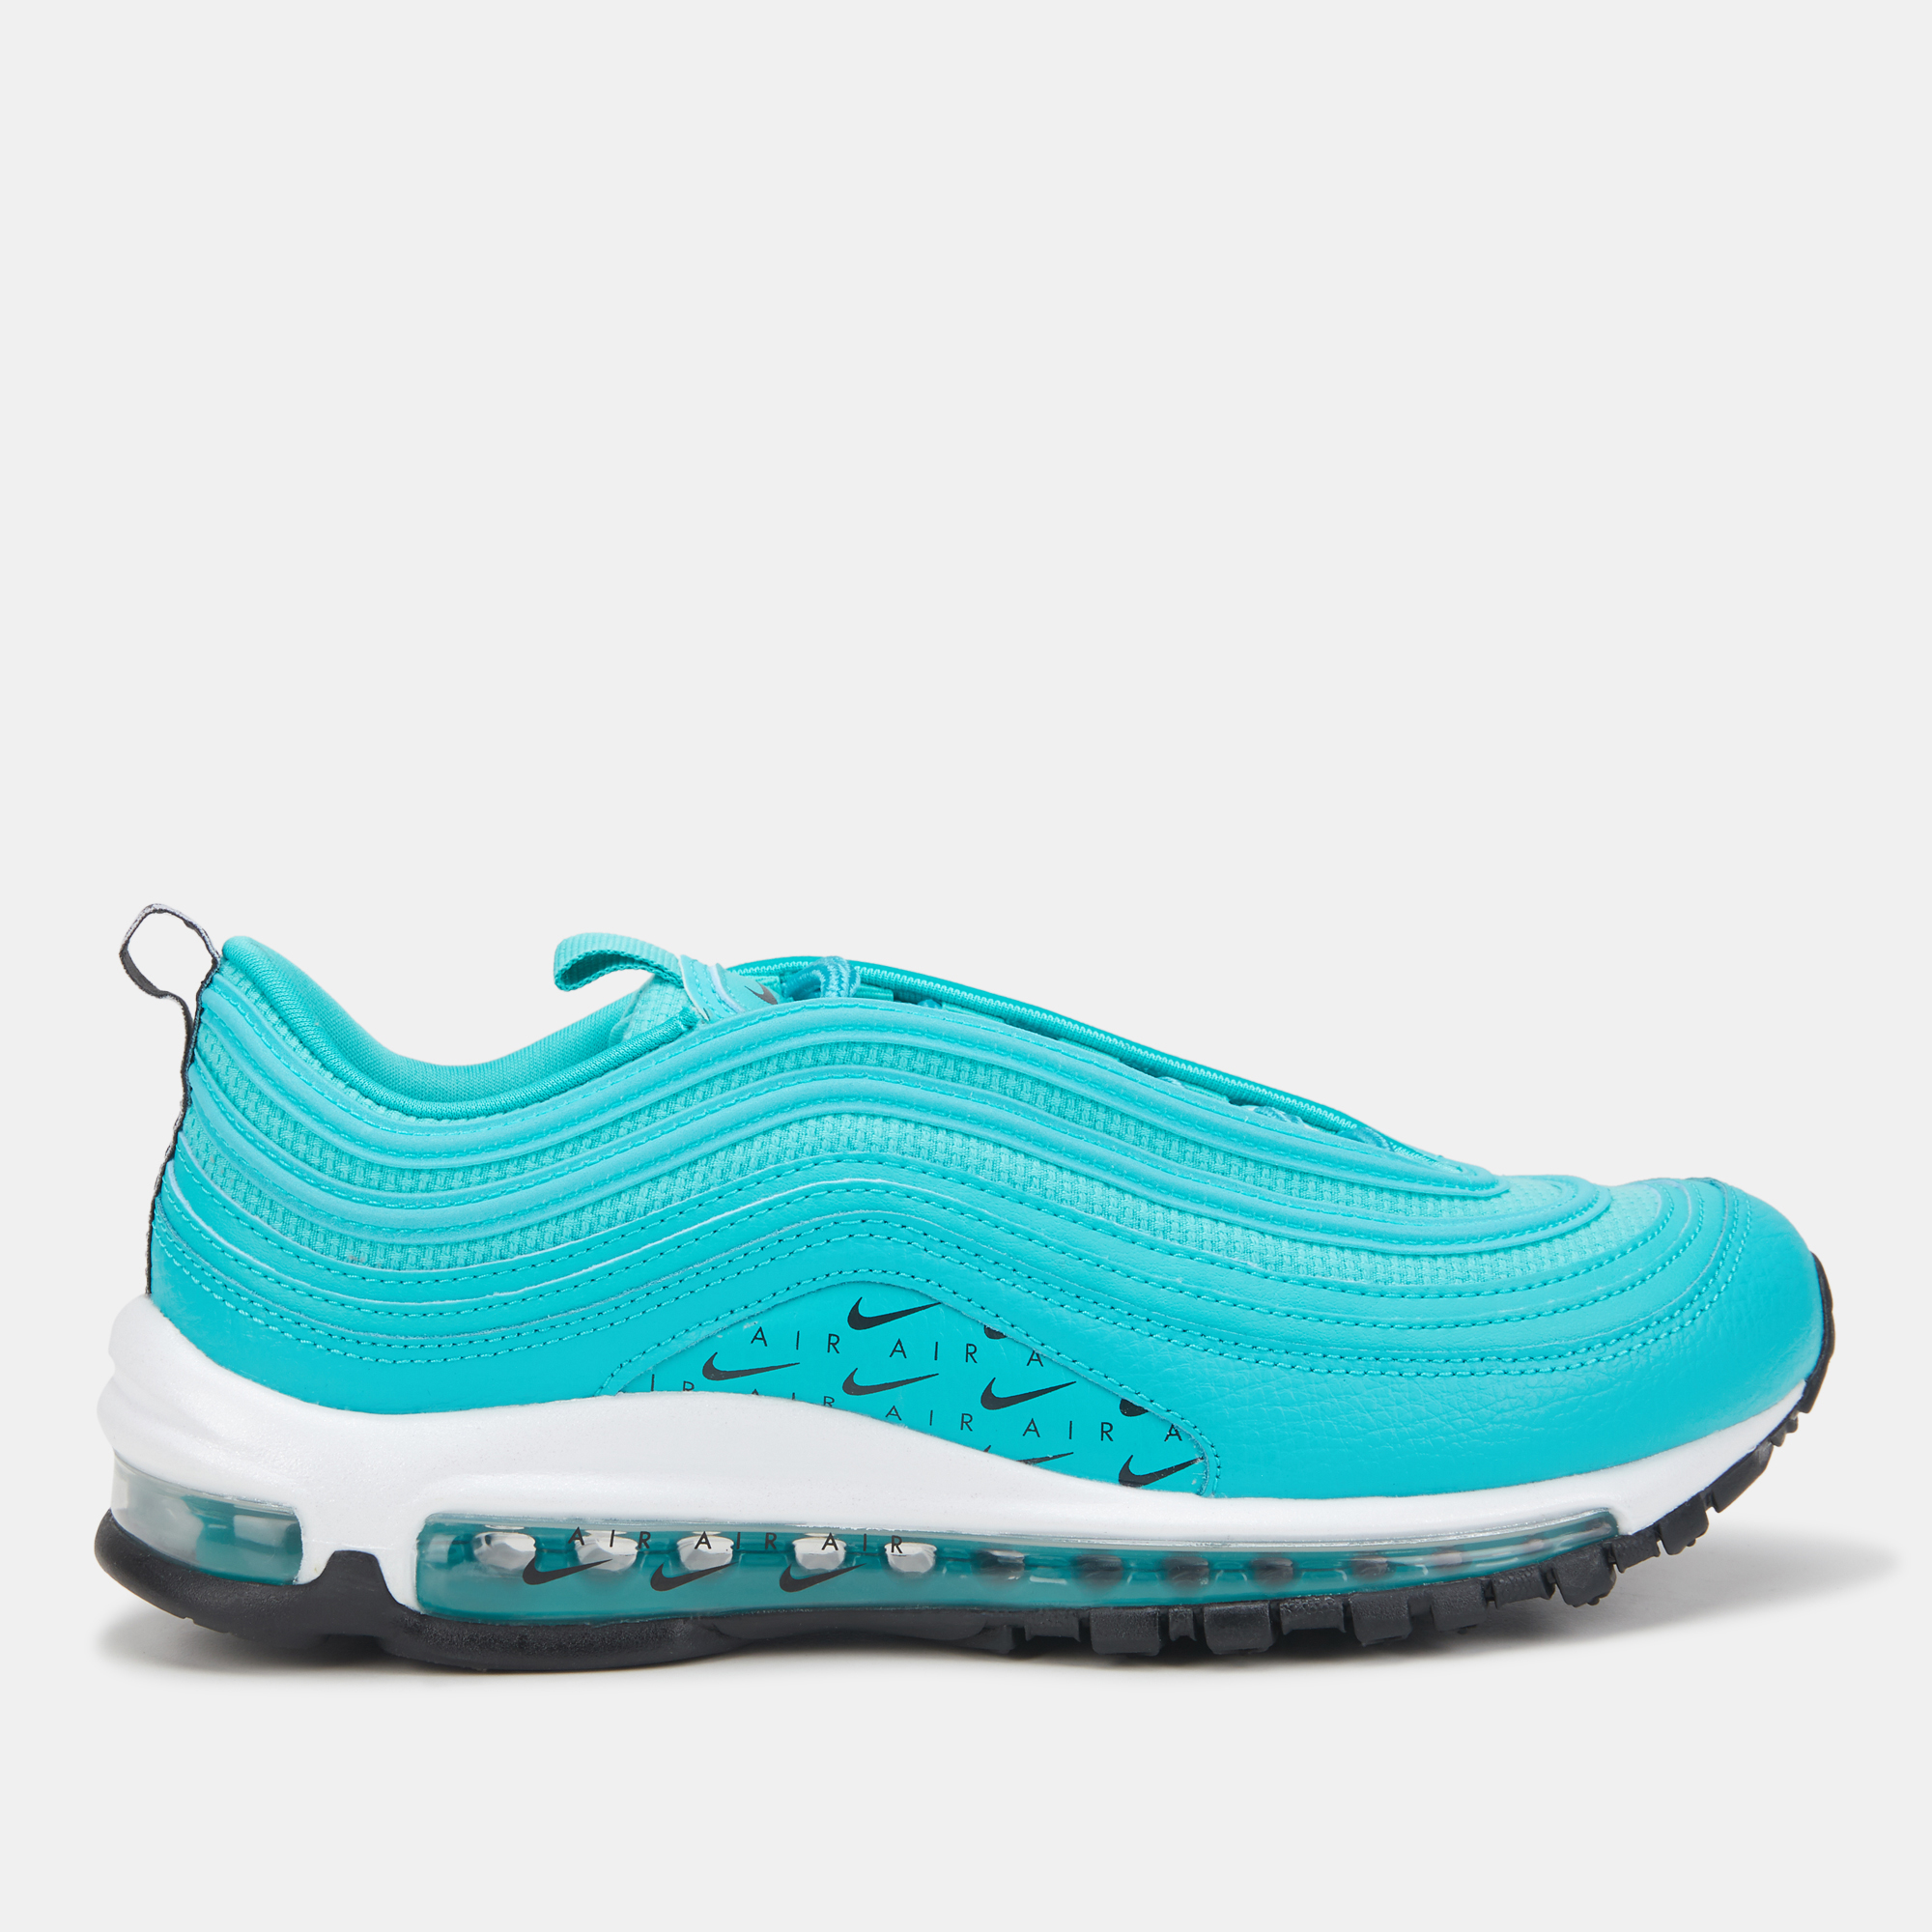 Nike Air Max '97 Lux Shoe